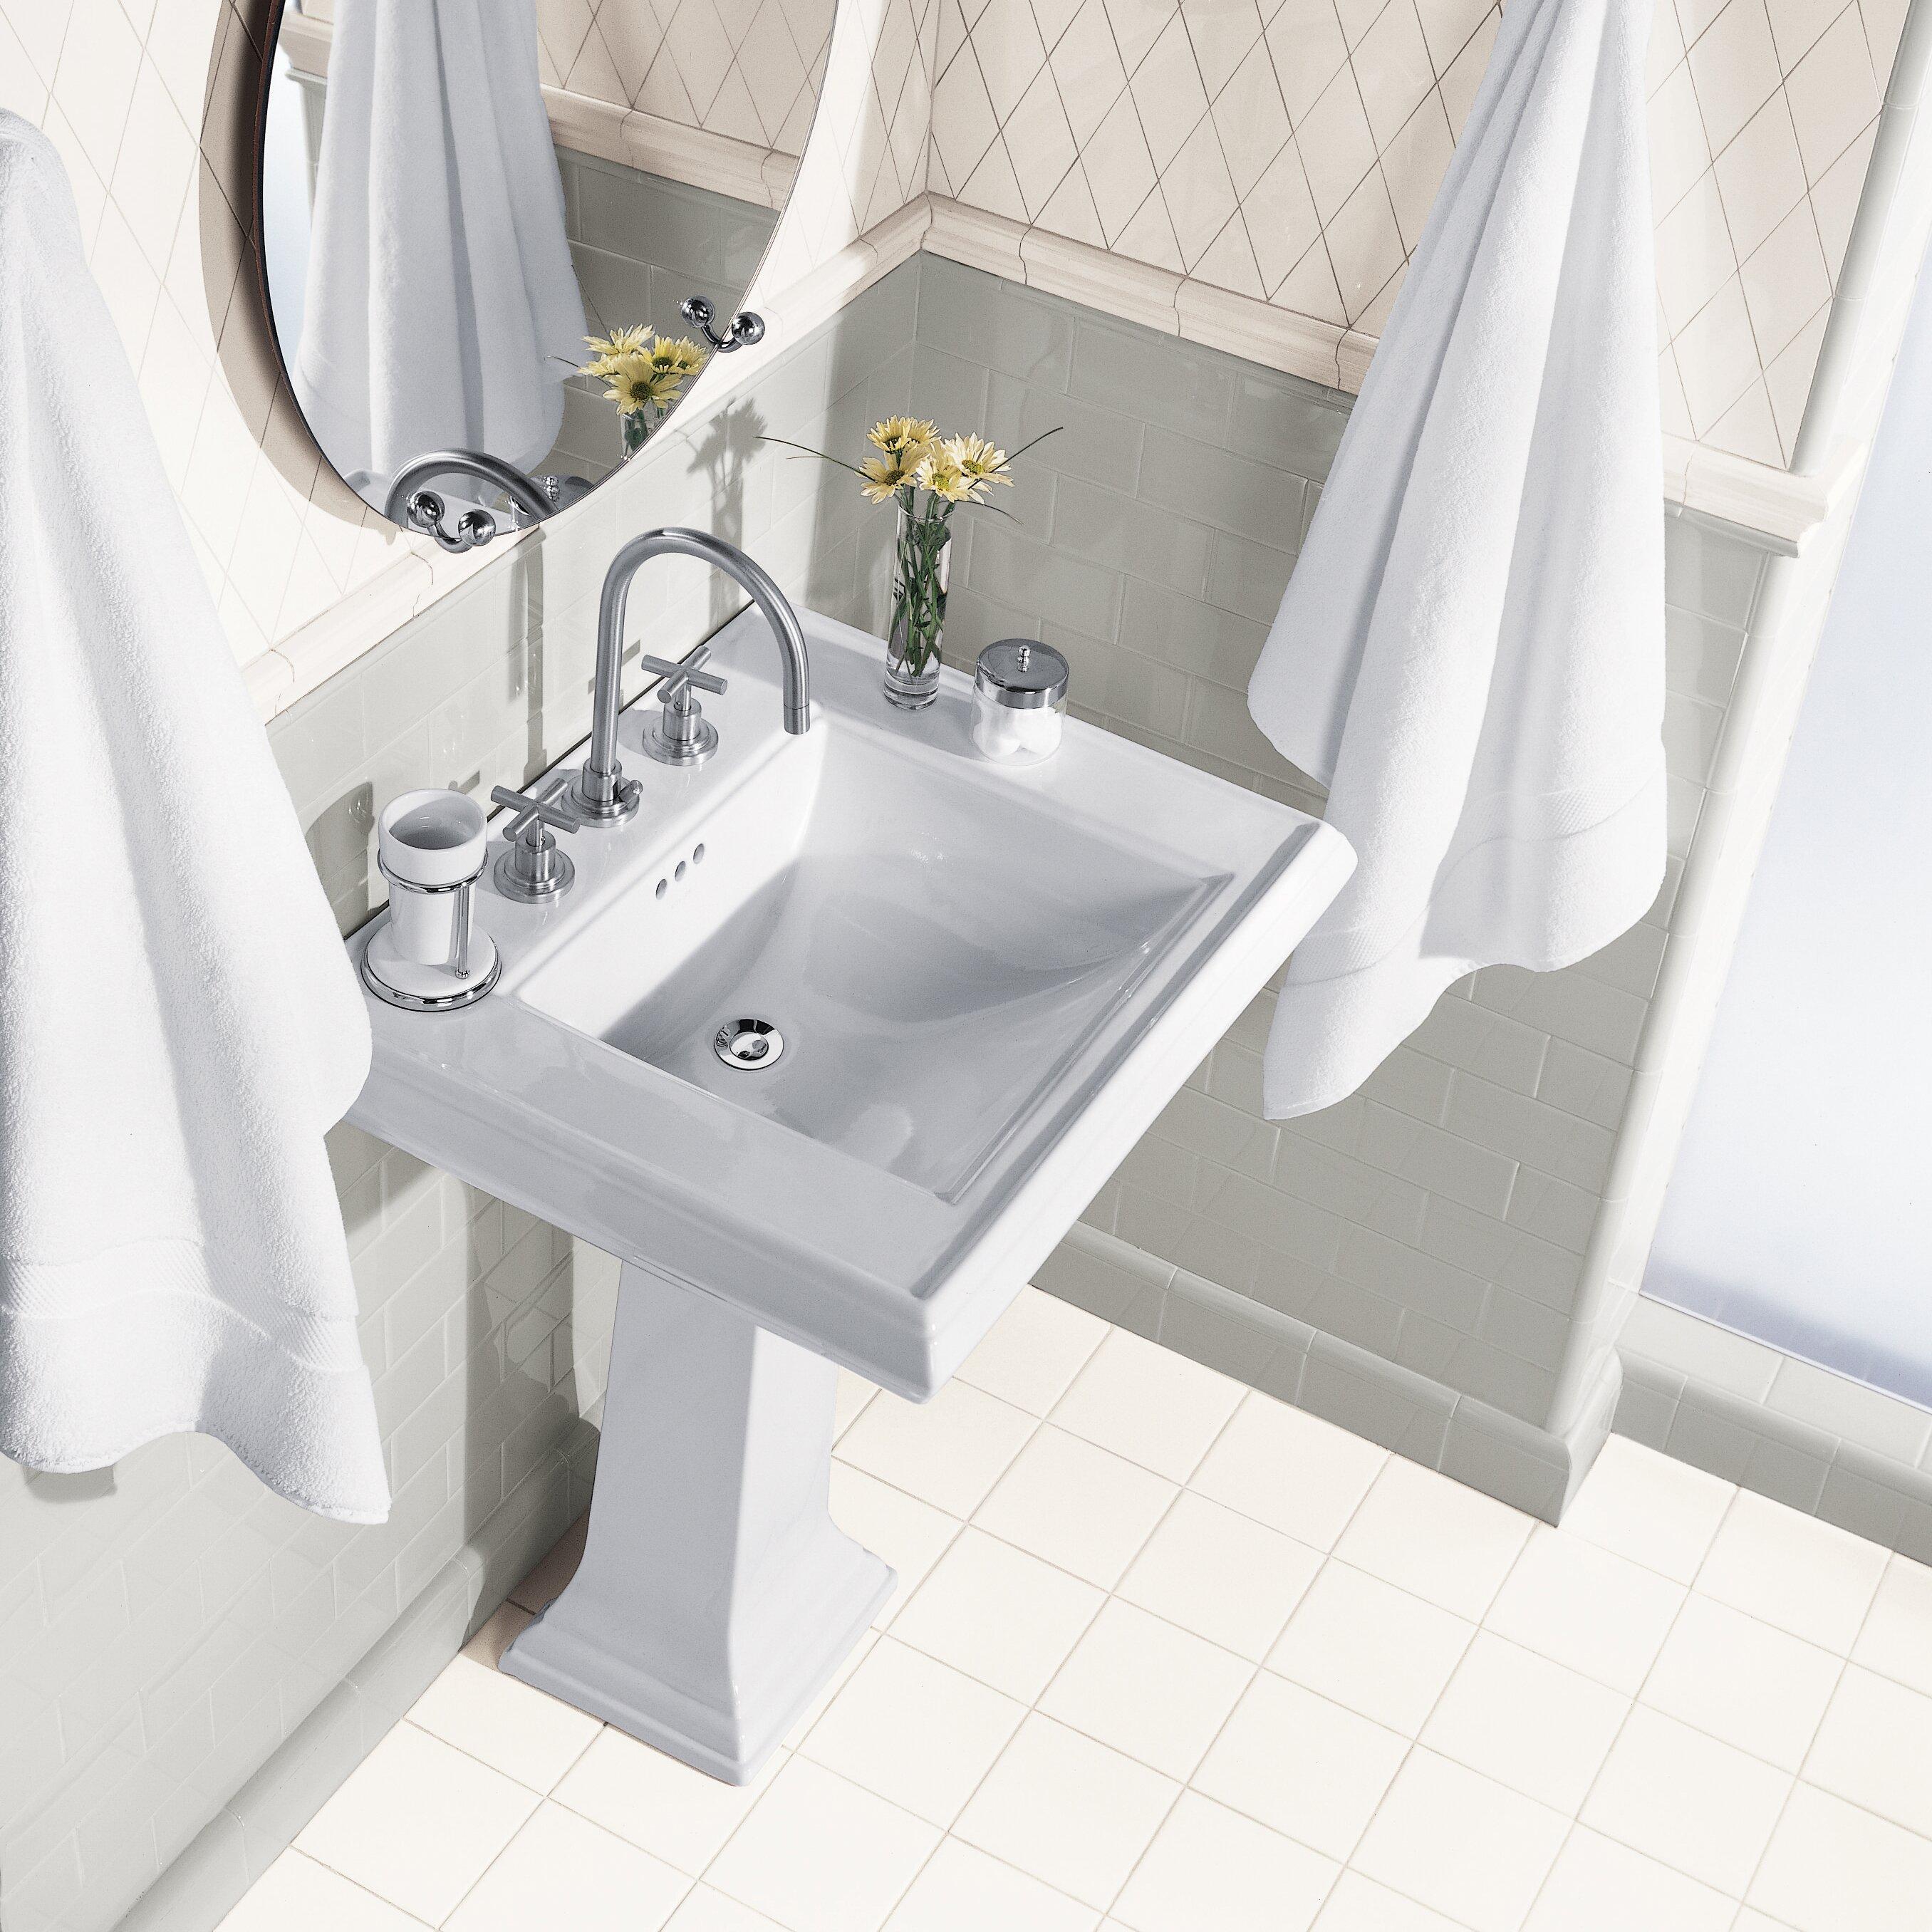 Daltile Bathroom Tile Daltile Rittenhouse Square 3 X 6 Ceramic Subway Tile Reviews